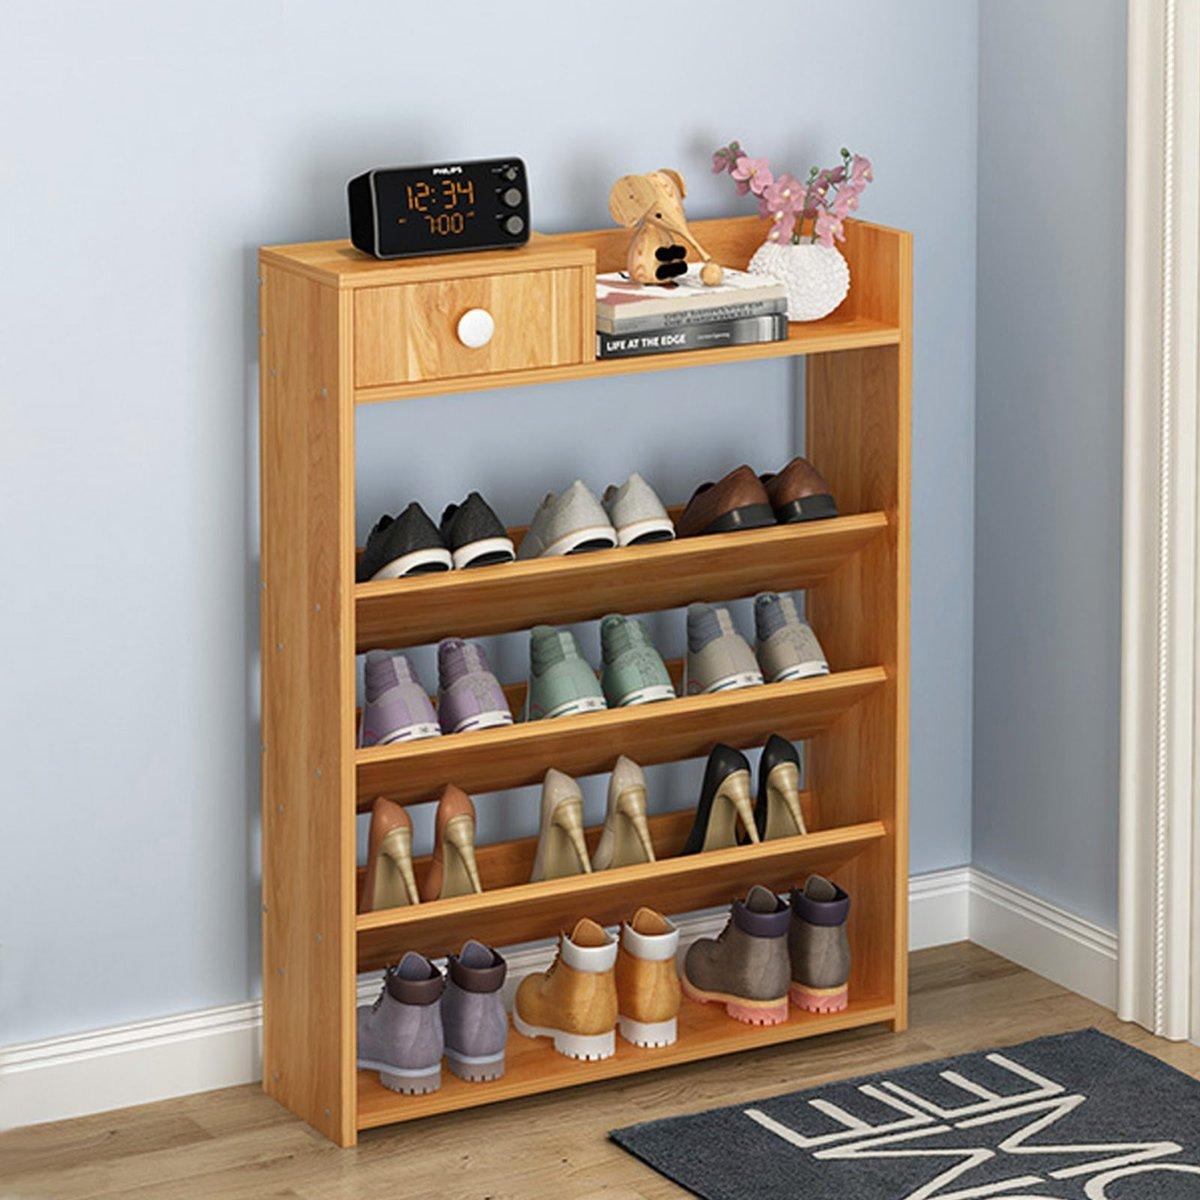 5 Tier Layer Wood Shoe Rack Organizer Storage Shelf With Drawer